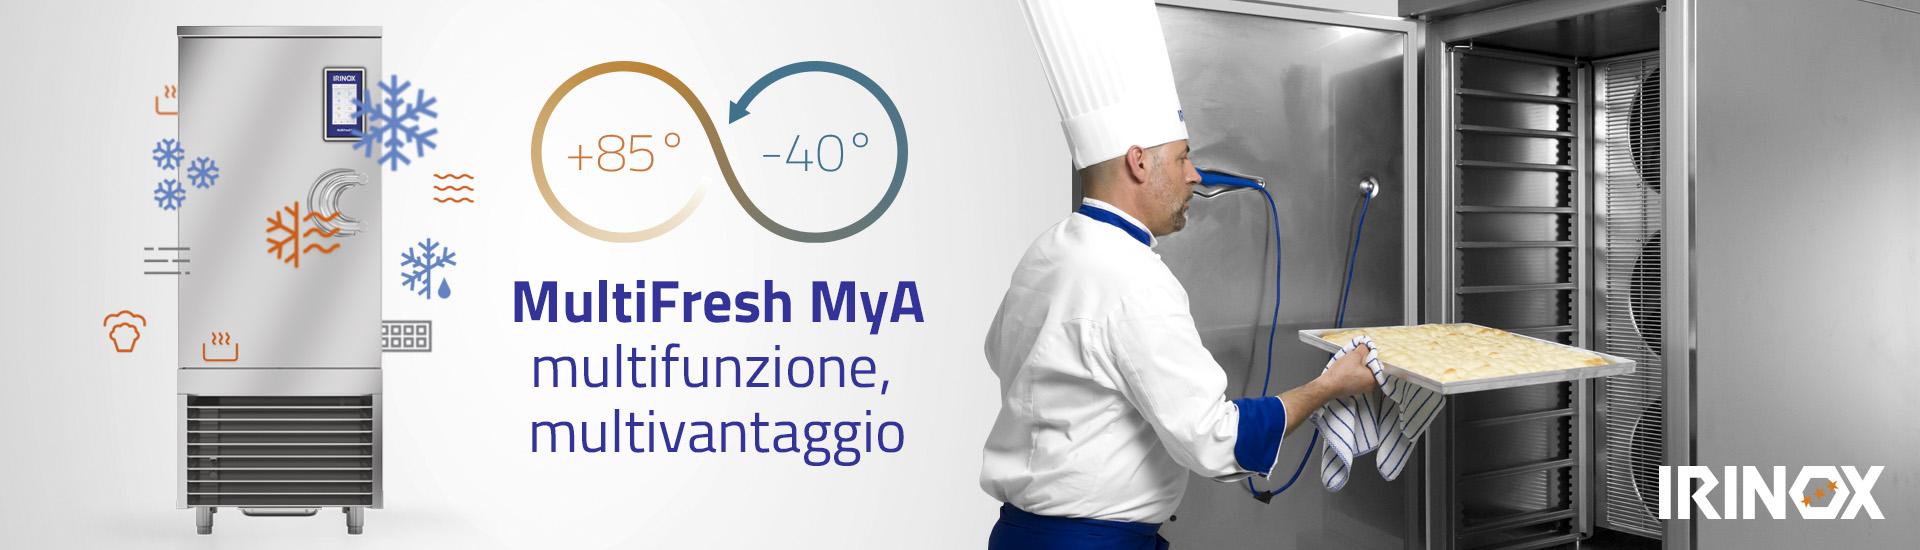 multifresh mya - irinox